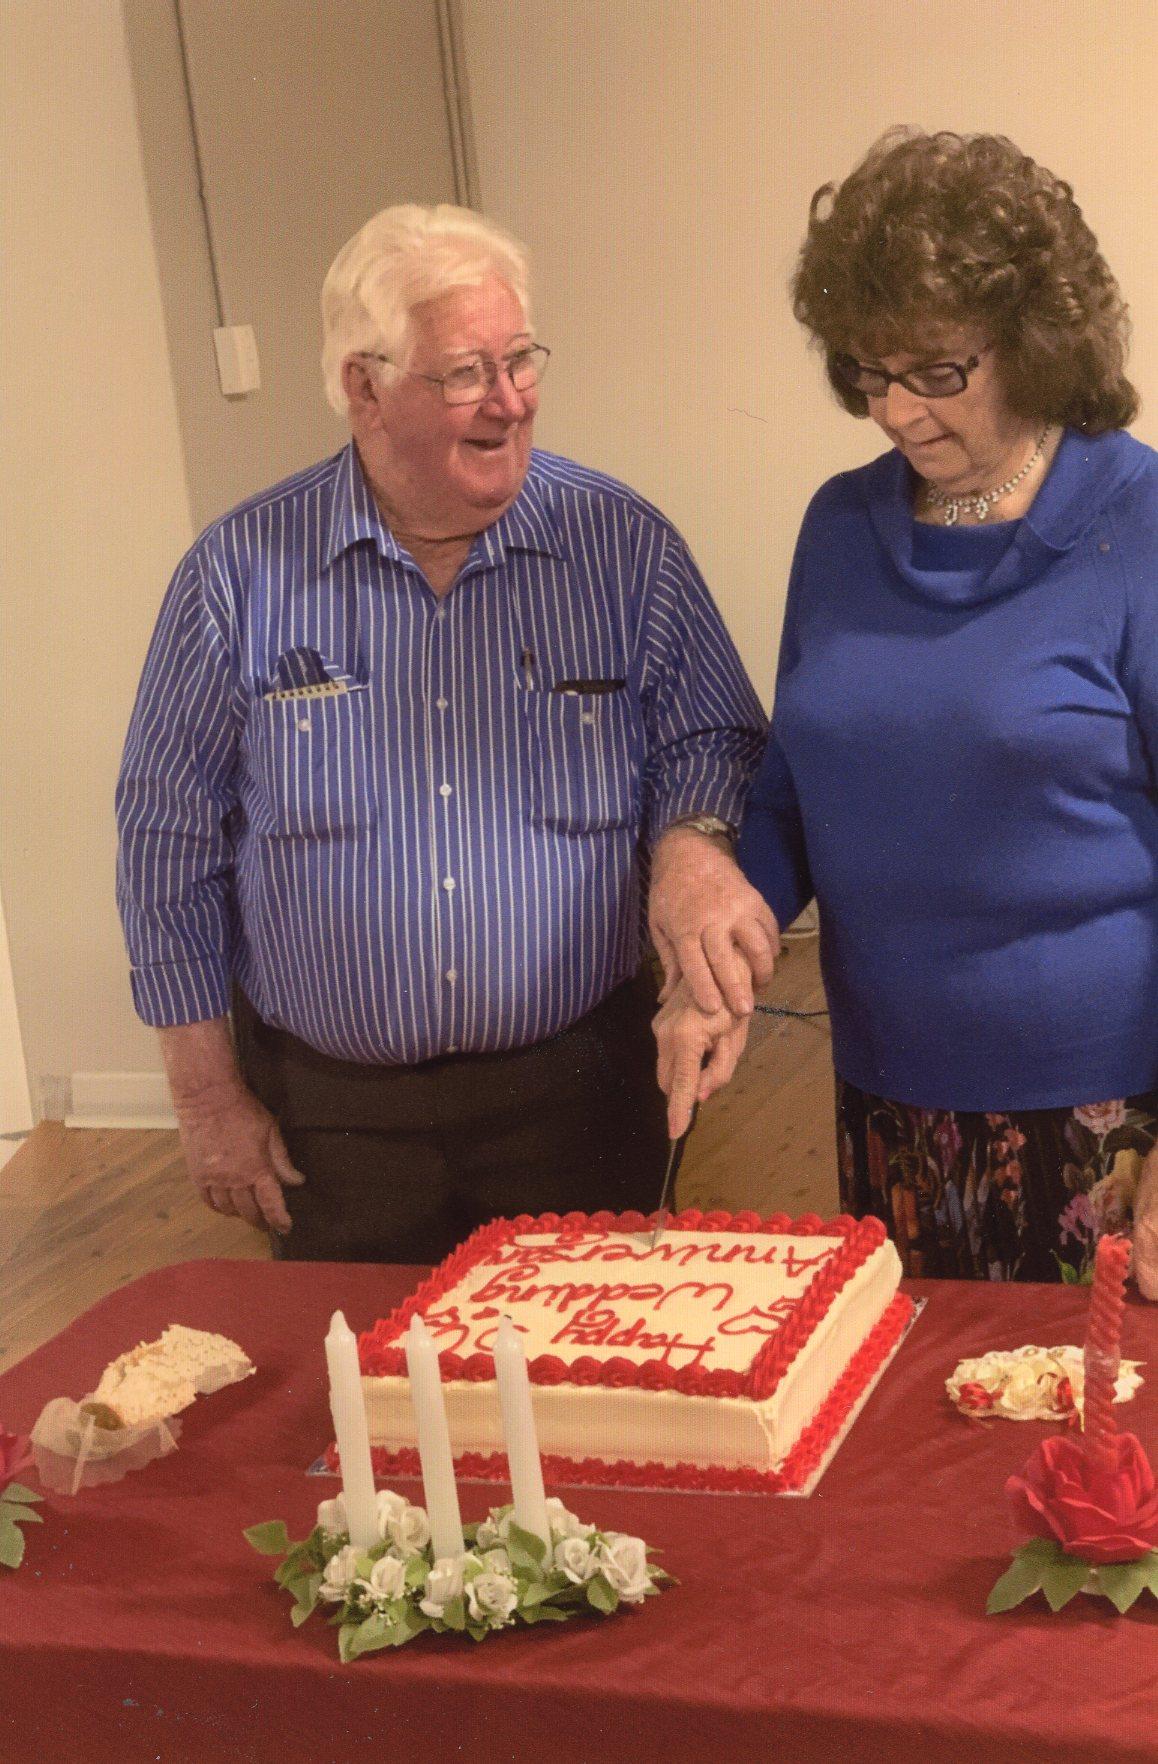 Garry and Diane Burr cutting their 50th wedding anniversary cake.